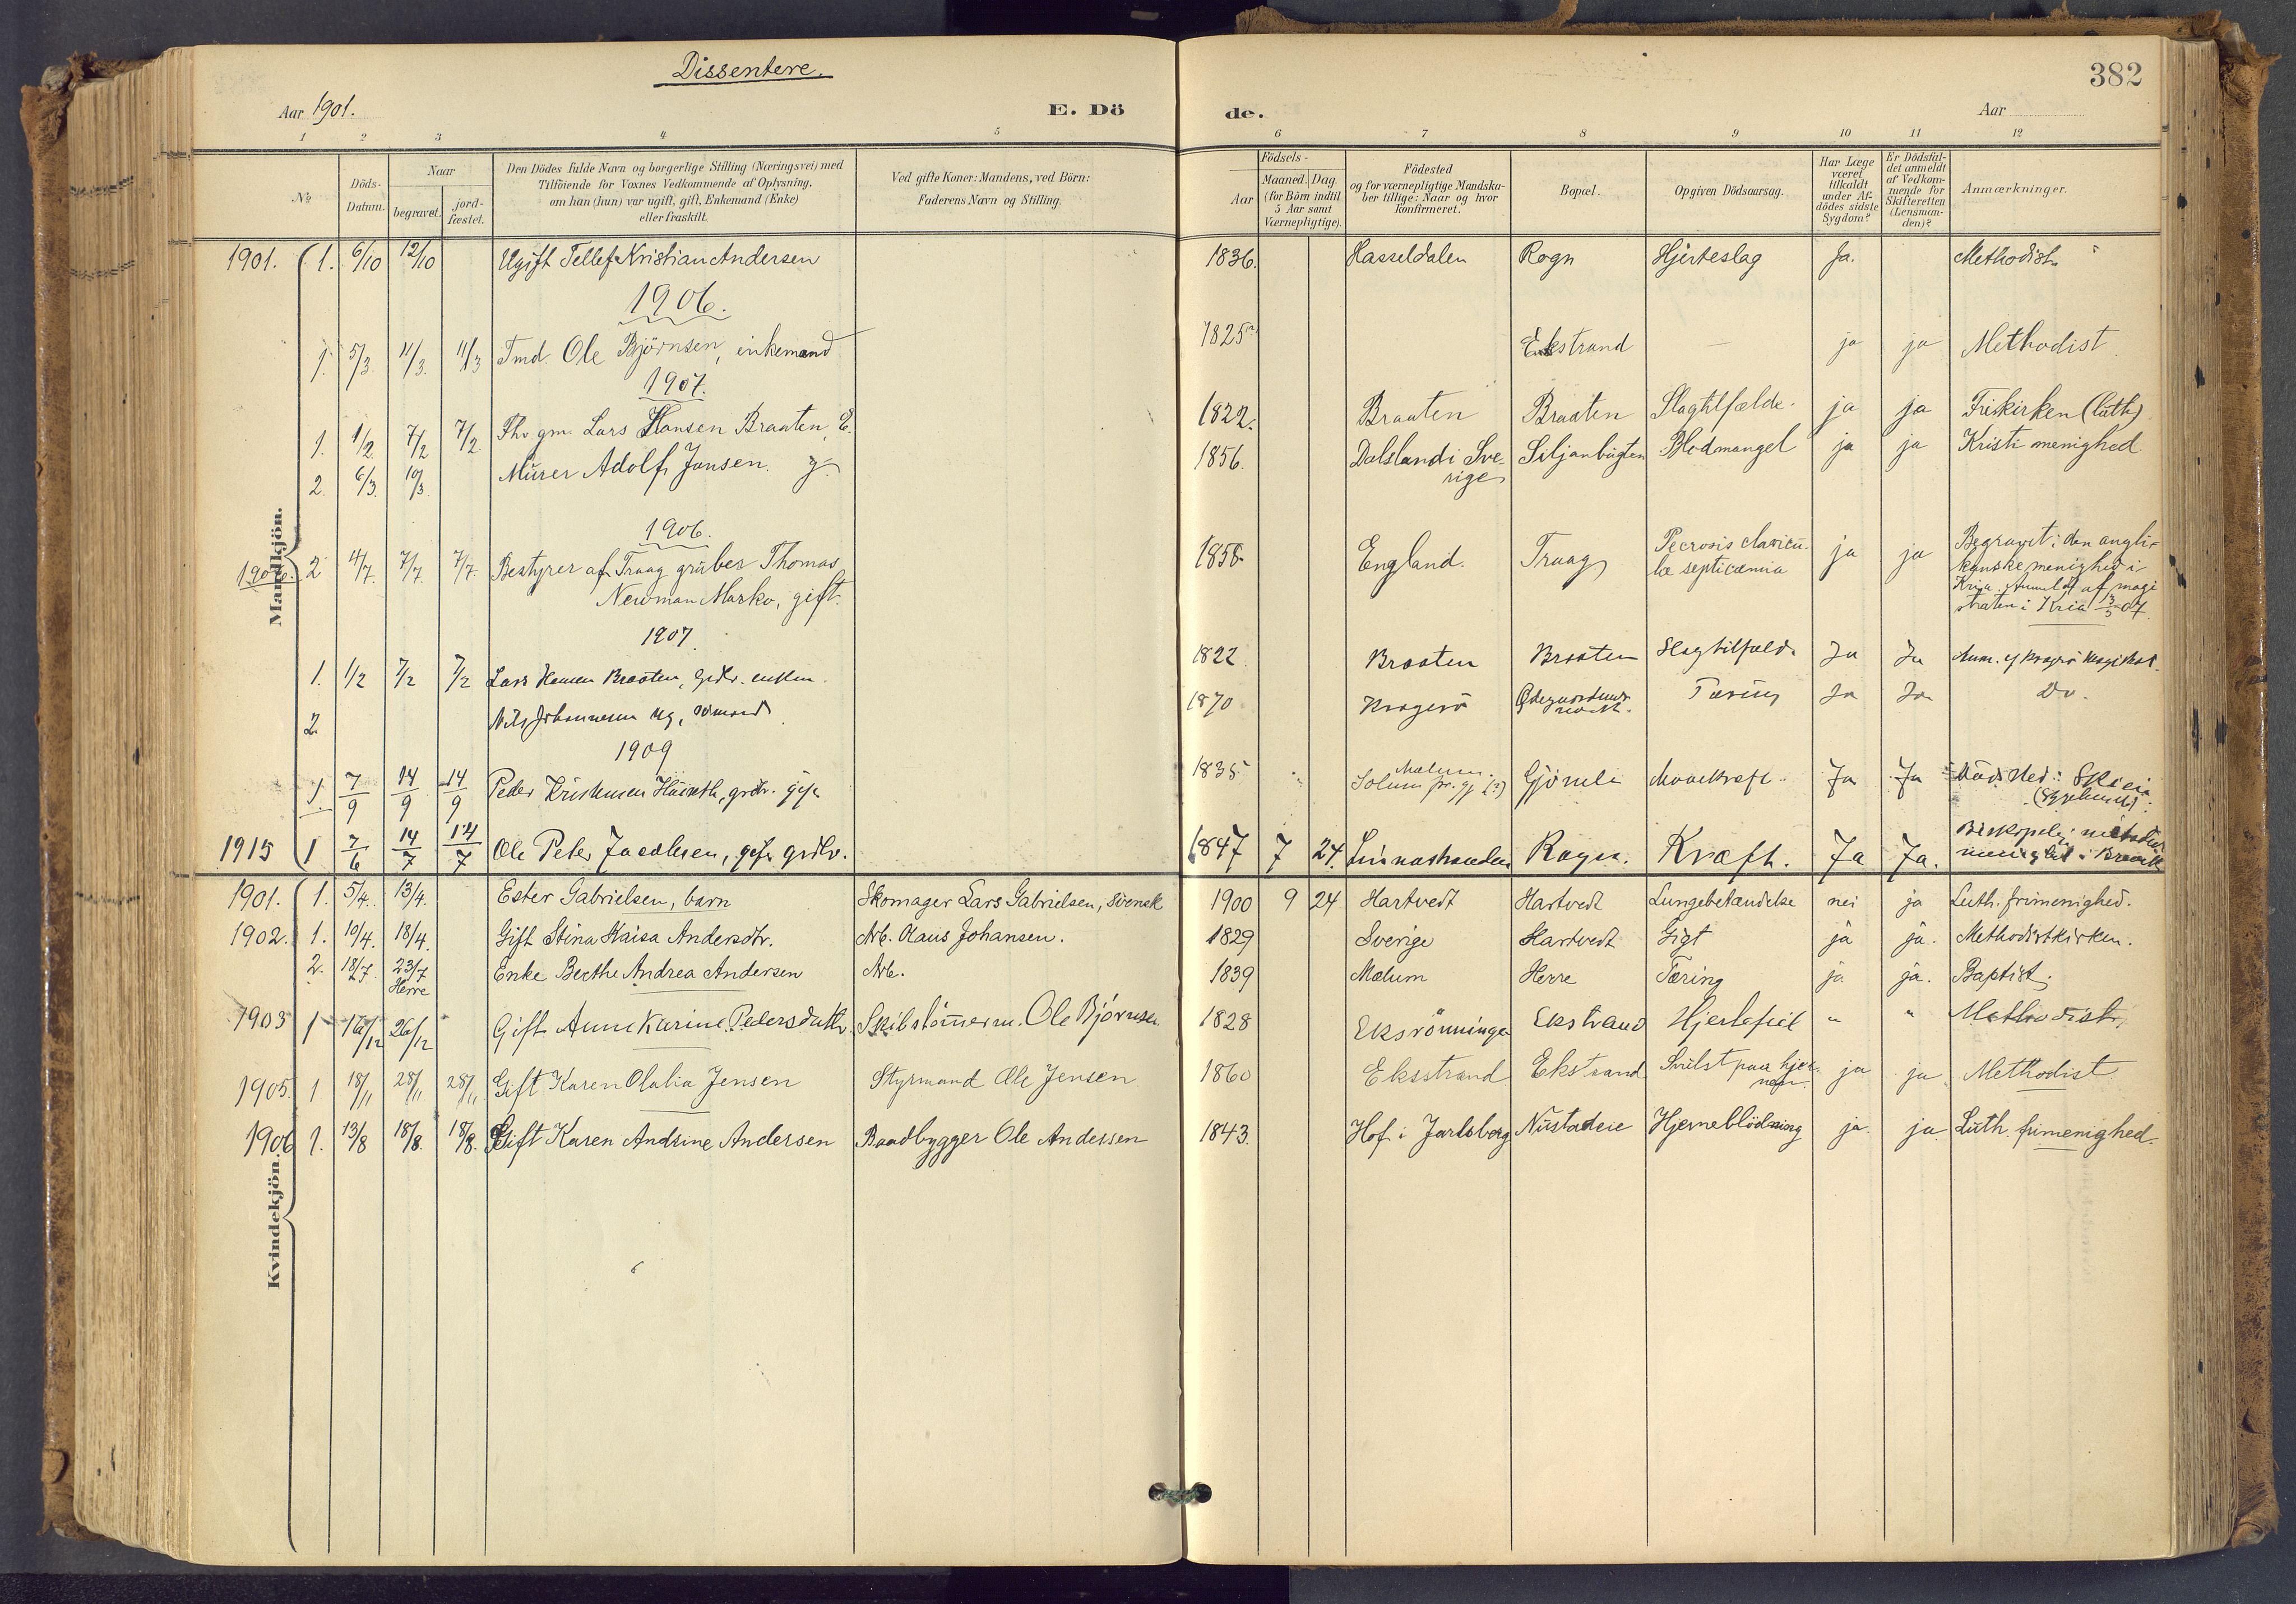 SAKO, Bamble kirkebøker, F/Fa/L0009: Ministerialbok nr. I 9, 1901-1917, s. 382